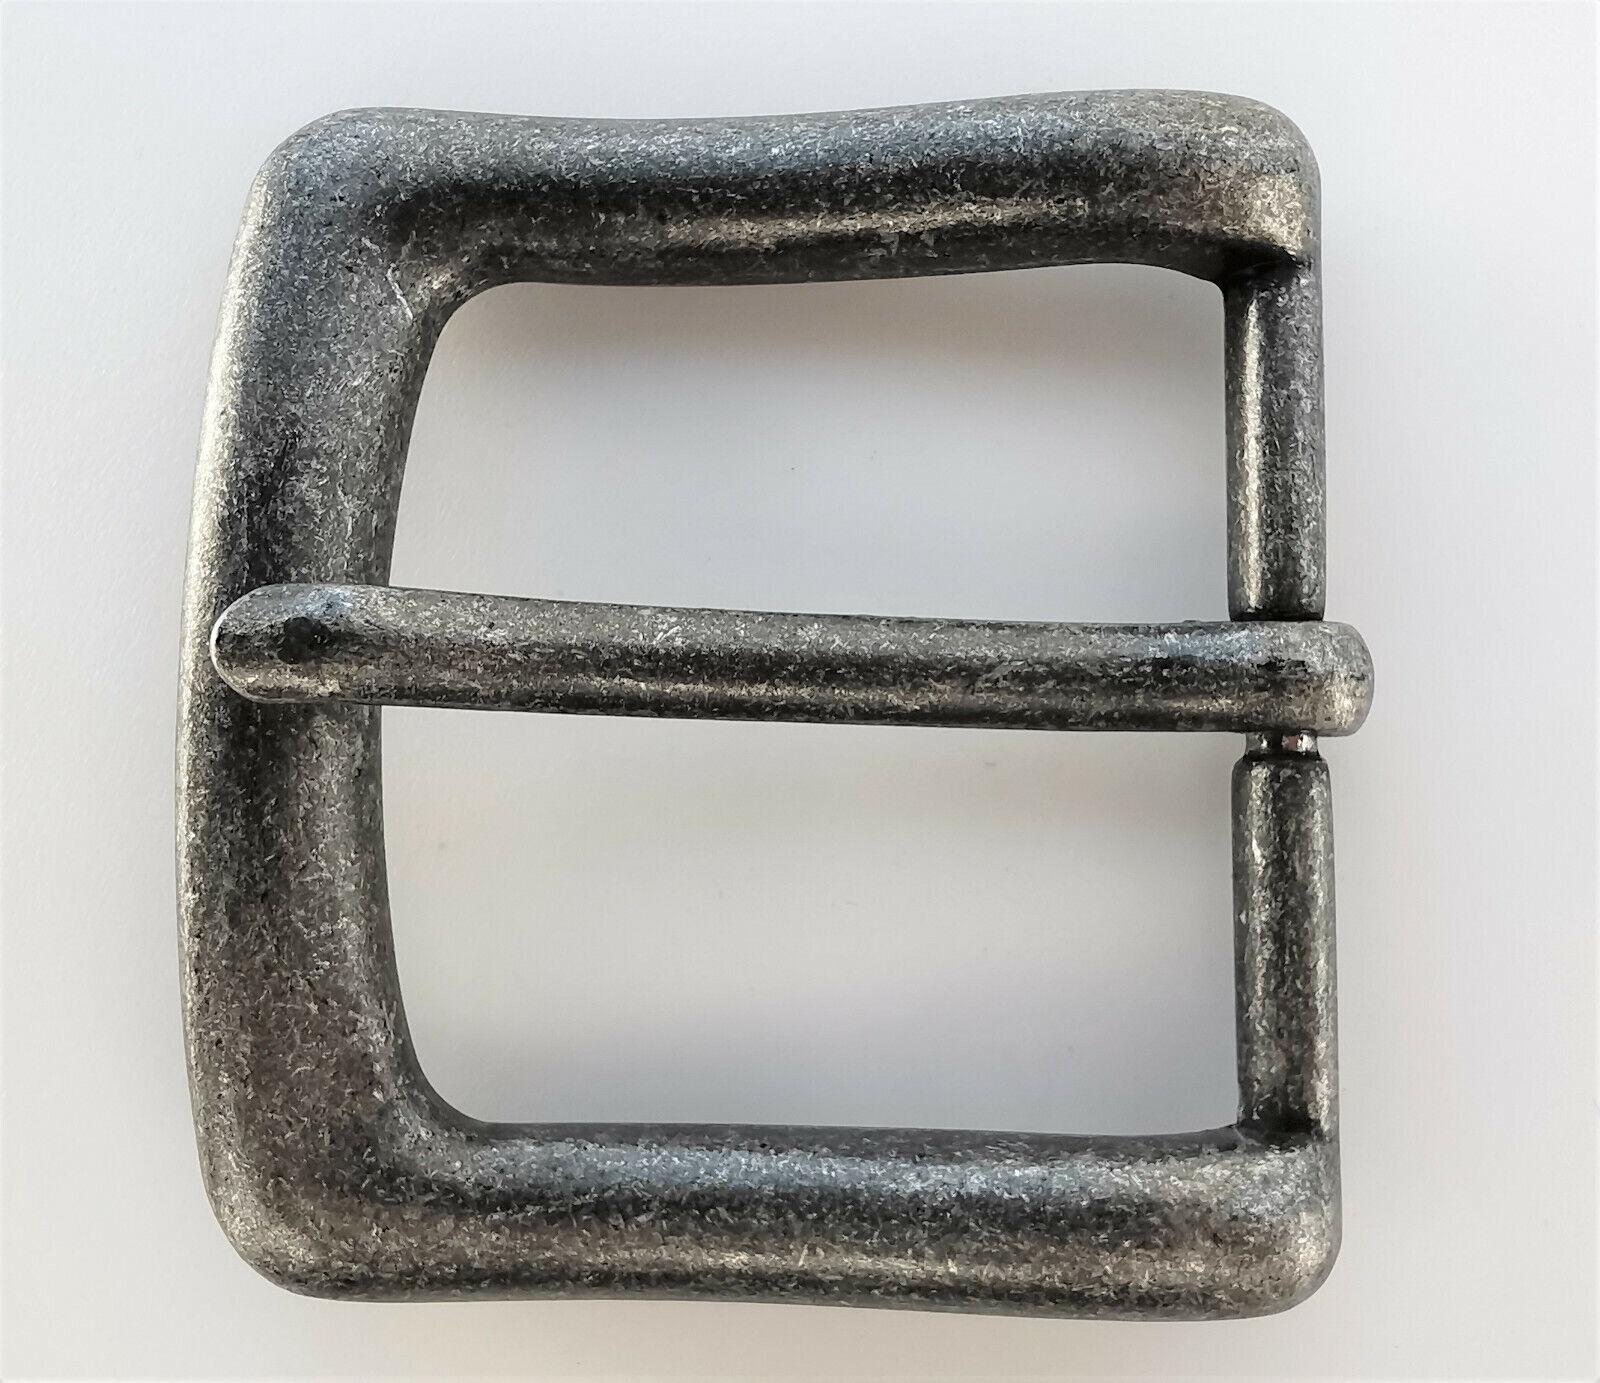 Jeans Belt Buckle gürtelschliesse Removable Belt Popper Belt 40 MM